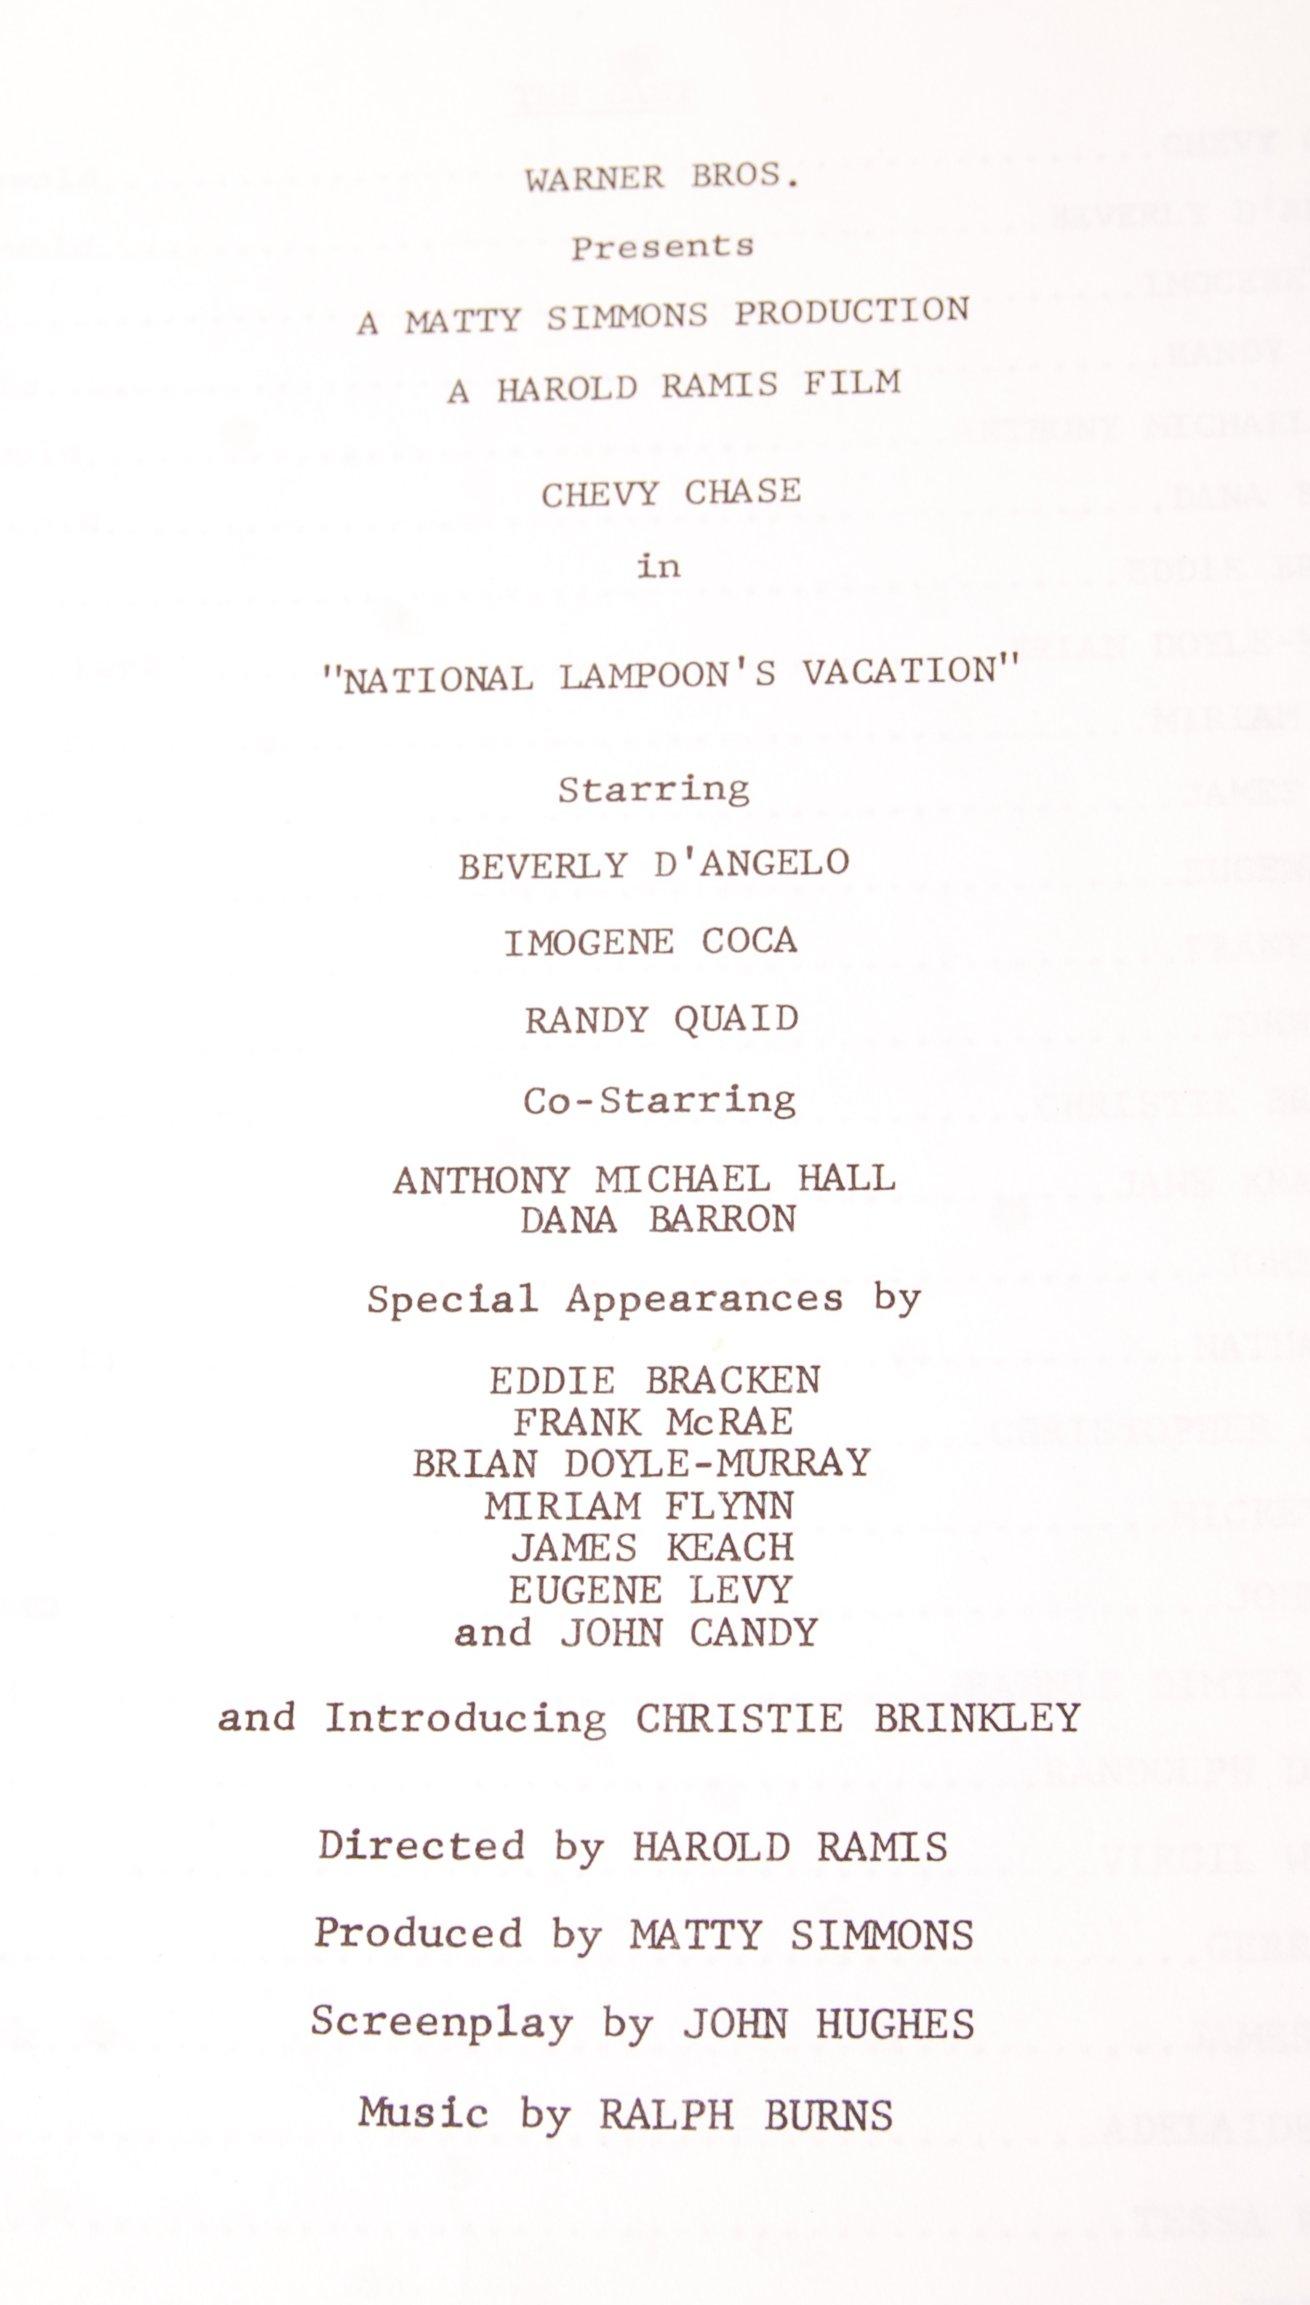 NATIONAL LAMPOON'S VACATION - 1983 - ORIGINAL PRES - Image 2 of 4